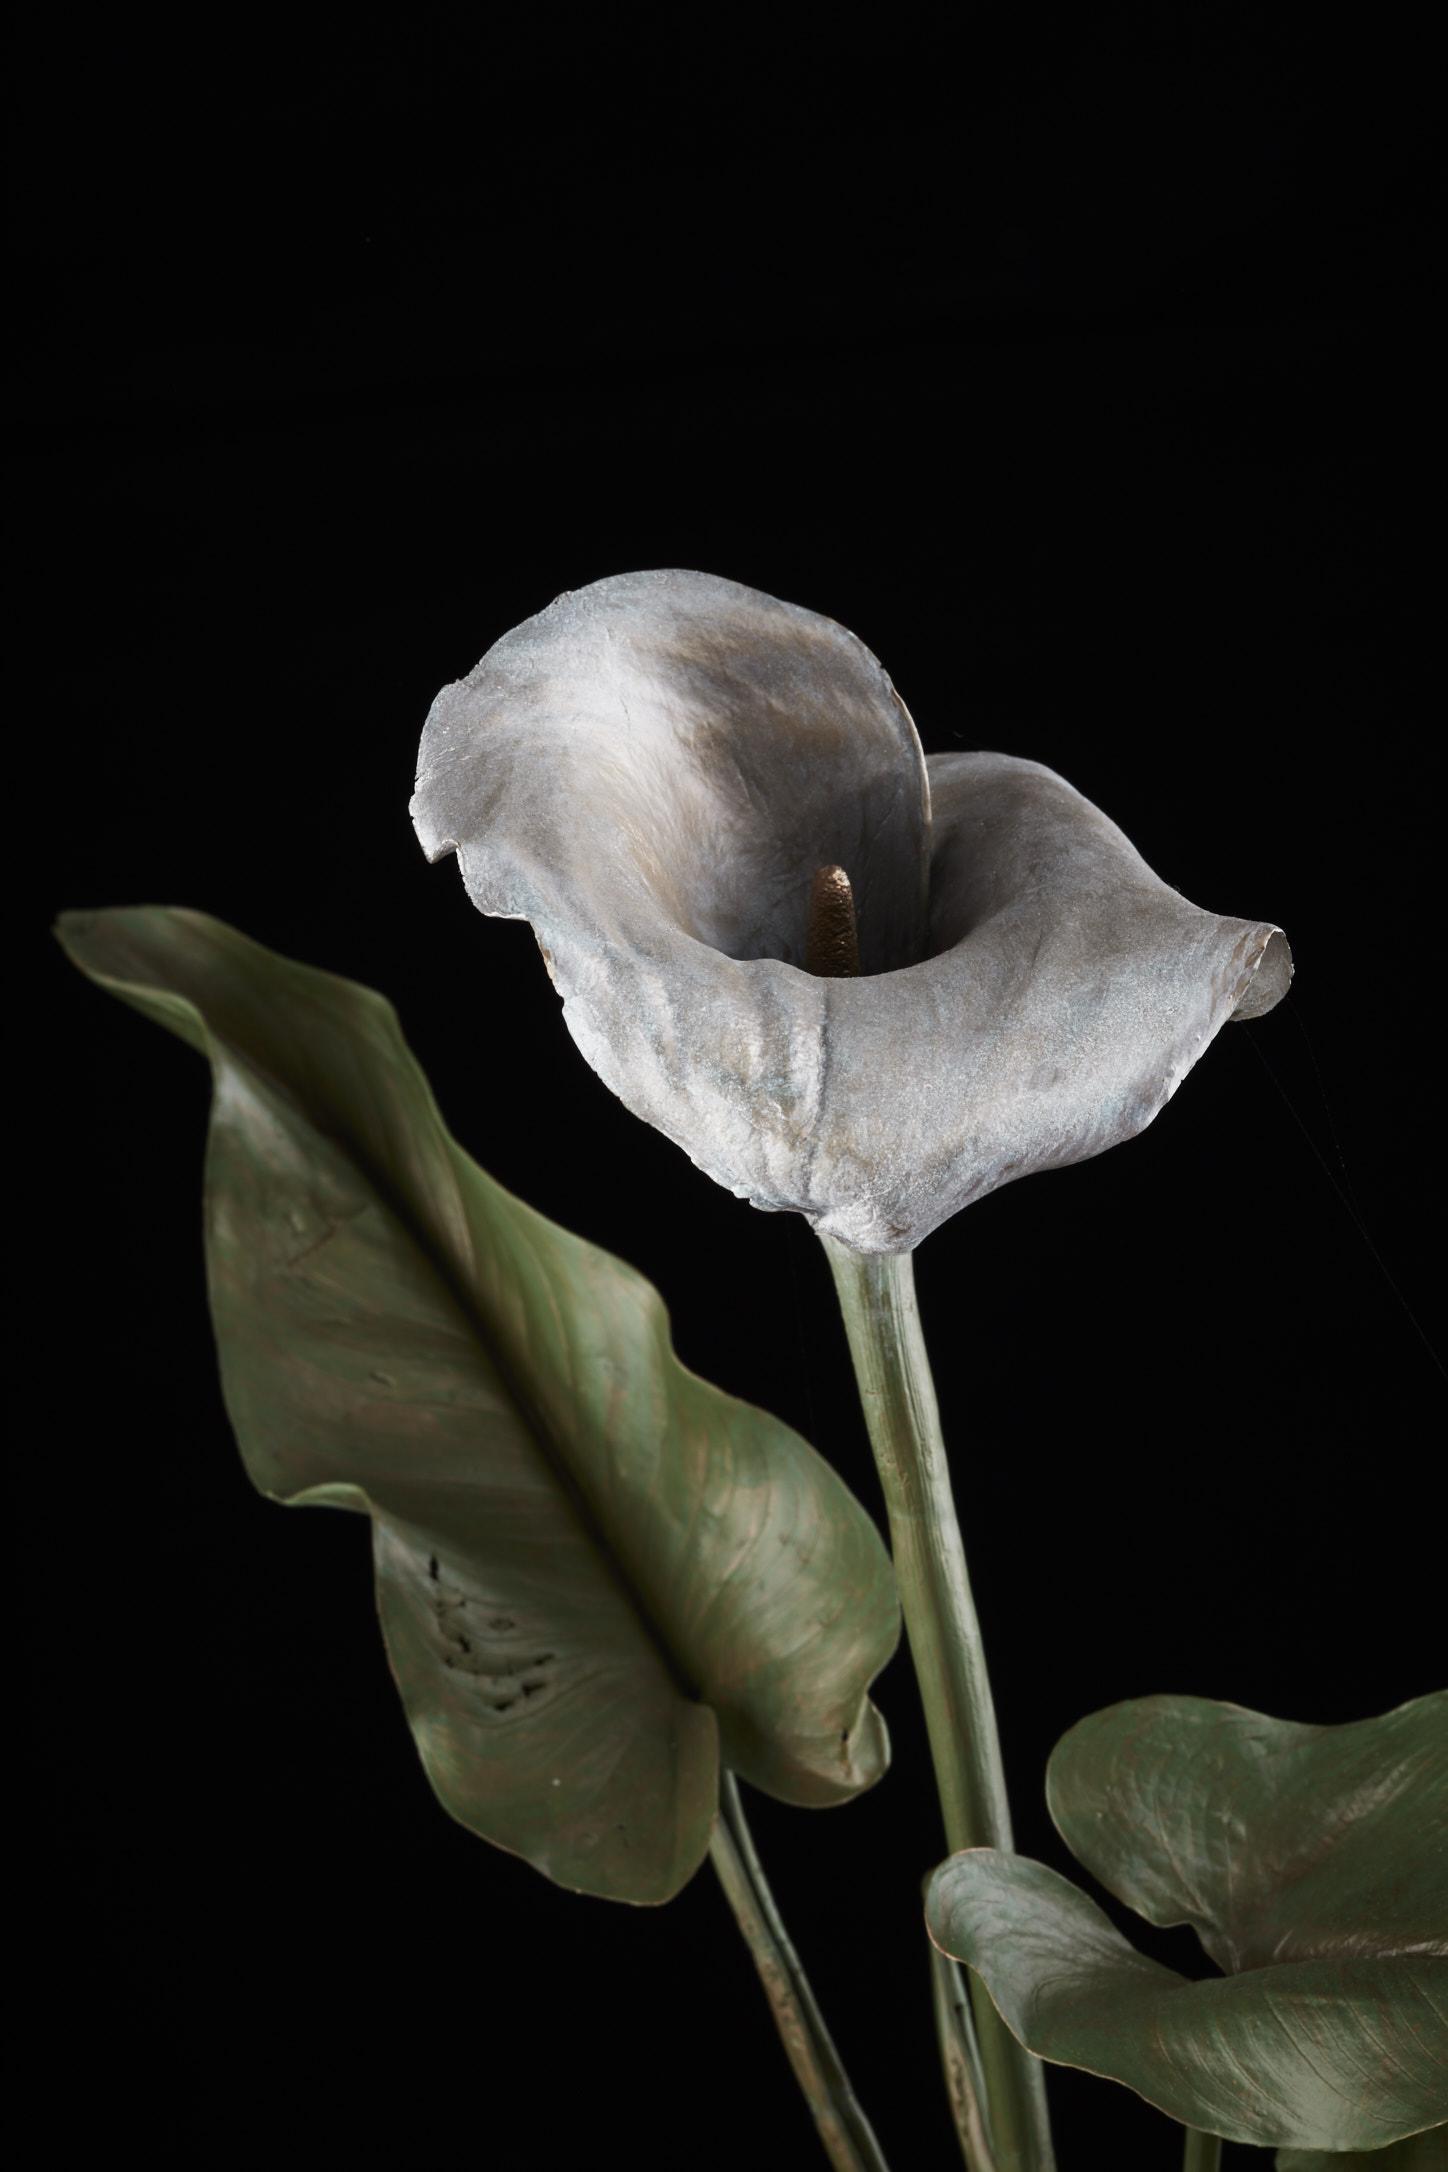 NicBladenBotanicals_LondonEX_Zantedeschia aethiopica(arum)_6072.jpg